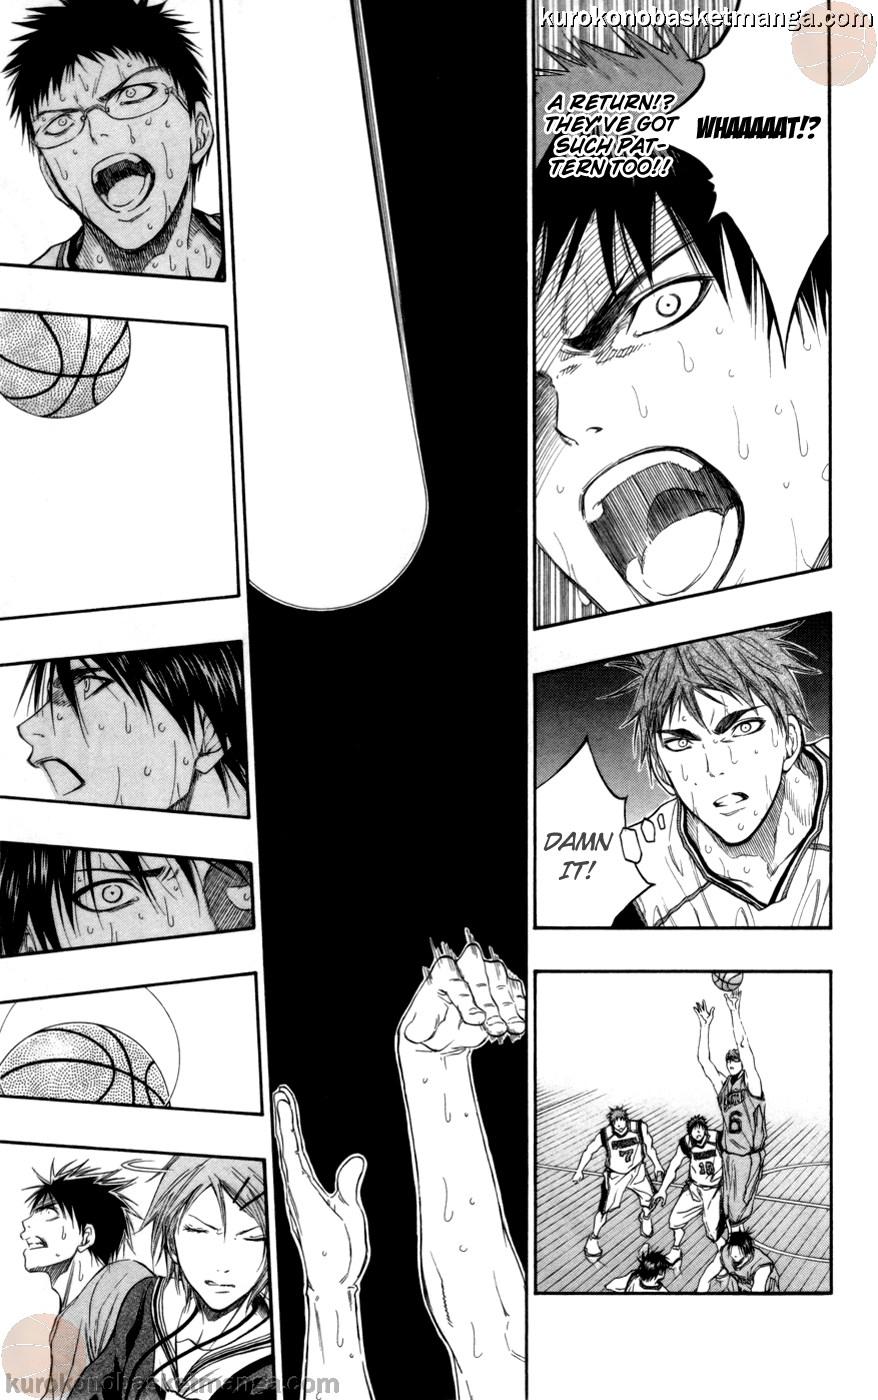 Kuroko no Basket Manga Chapter 89 - Image 07